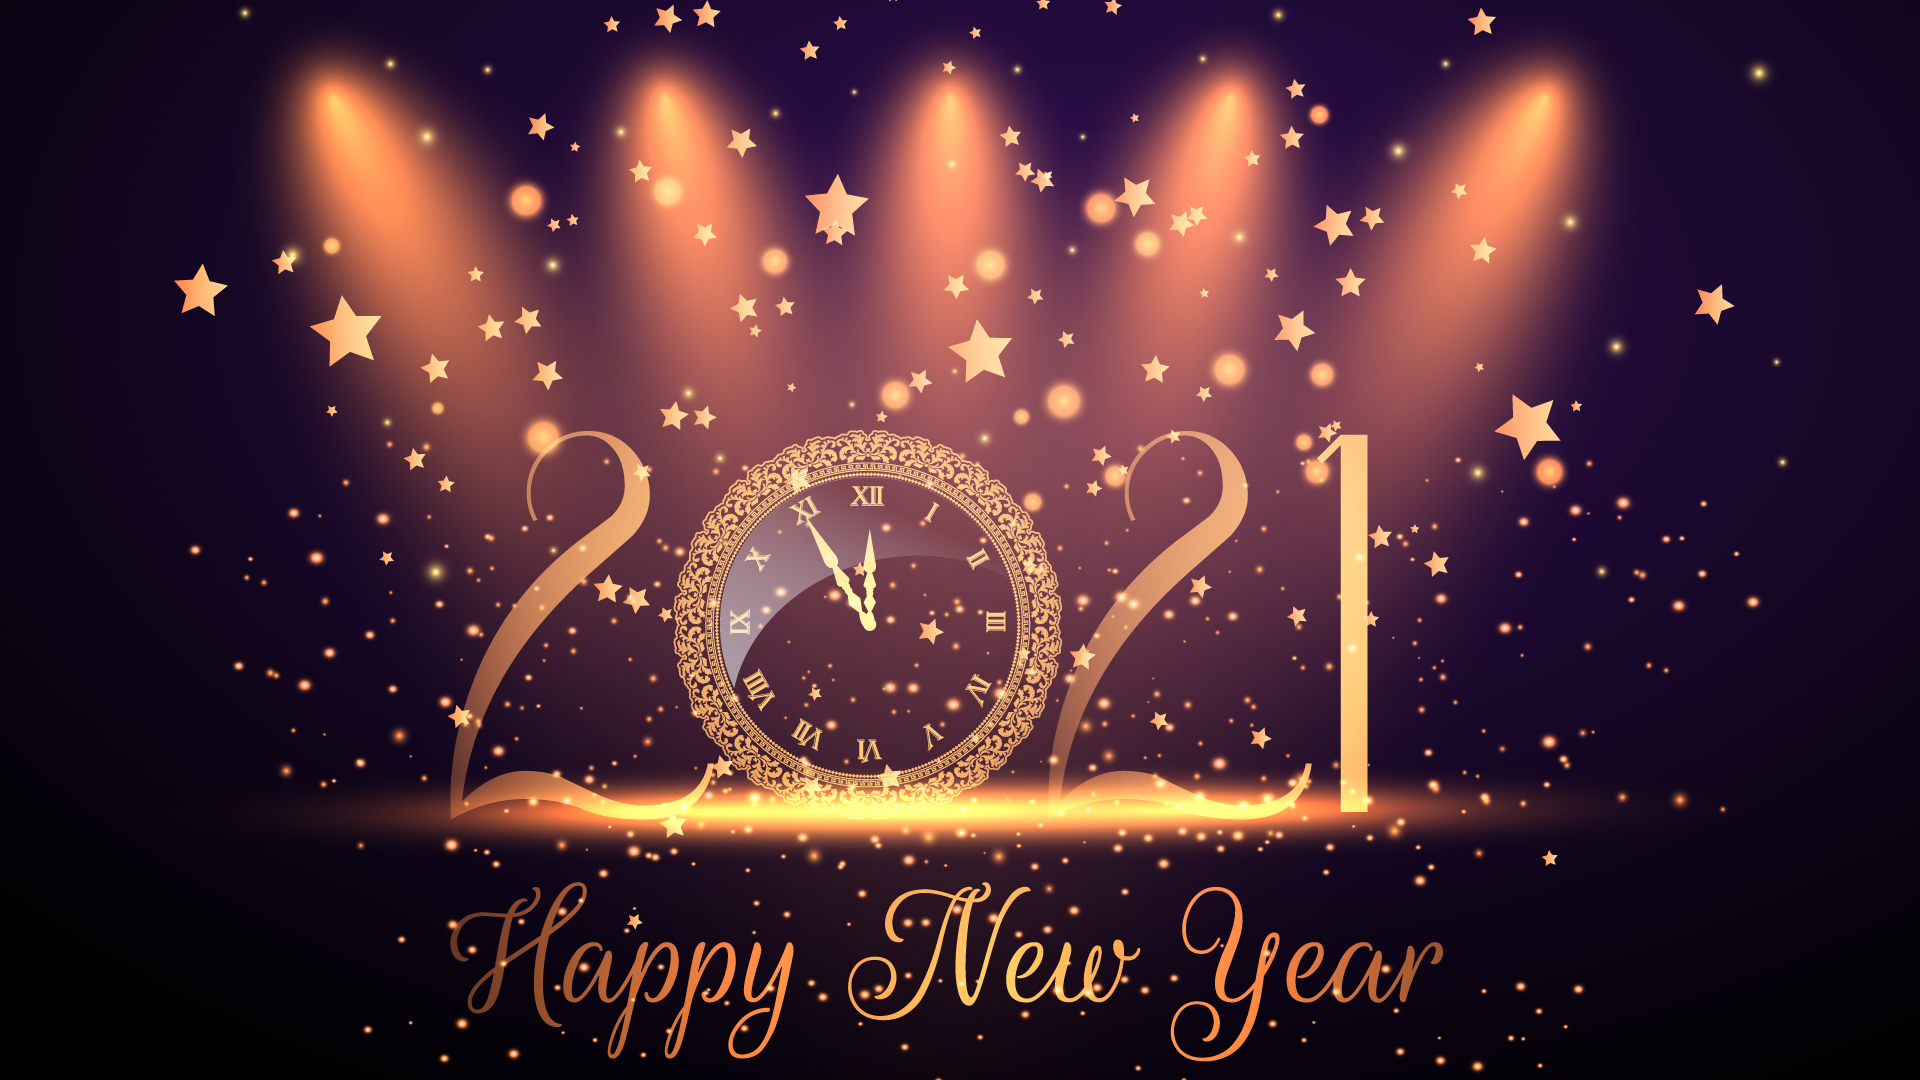 Happy New Year 2021 HD Wallpaper